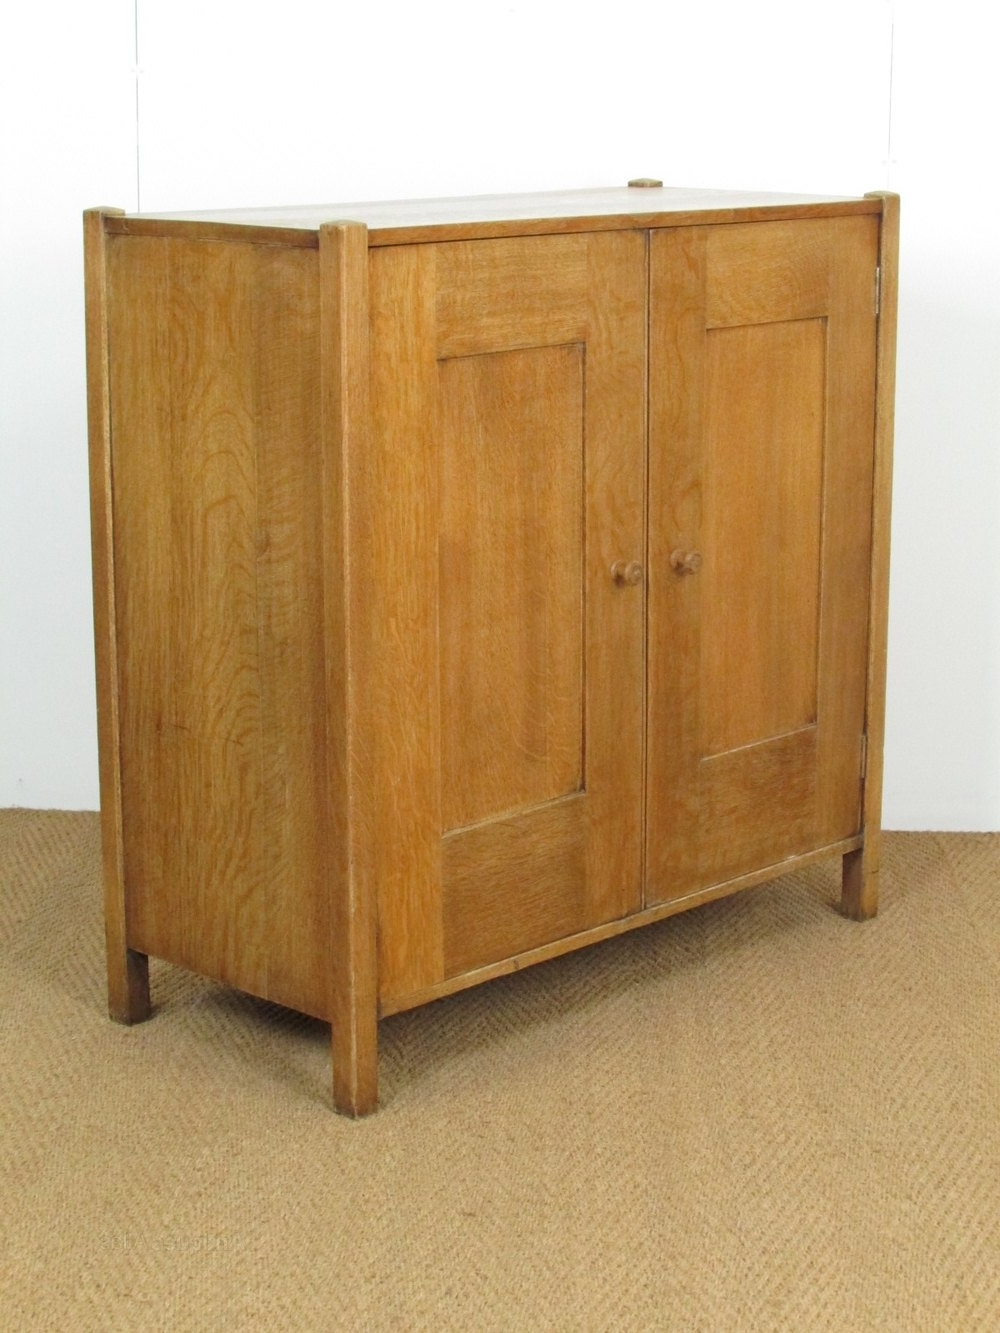 Heal's Arts & Crafts Oak Linen Cupboard – Antiques Atlas Regarding Most Up To Date Oak Linen Cupboard (View 6 of 15)